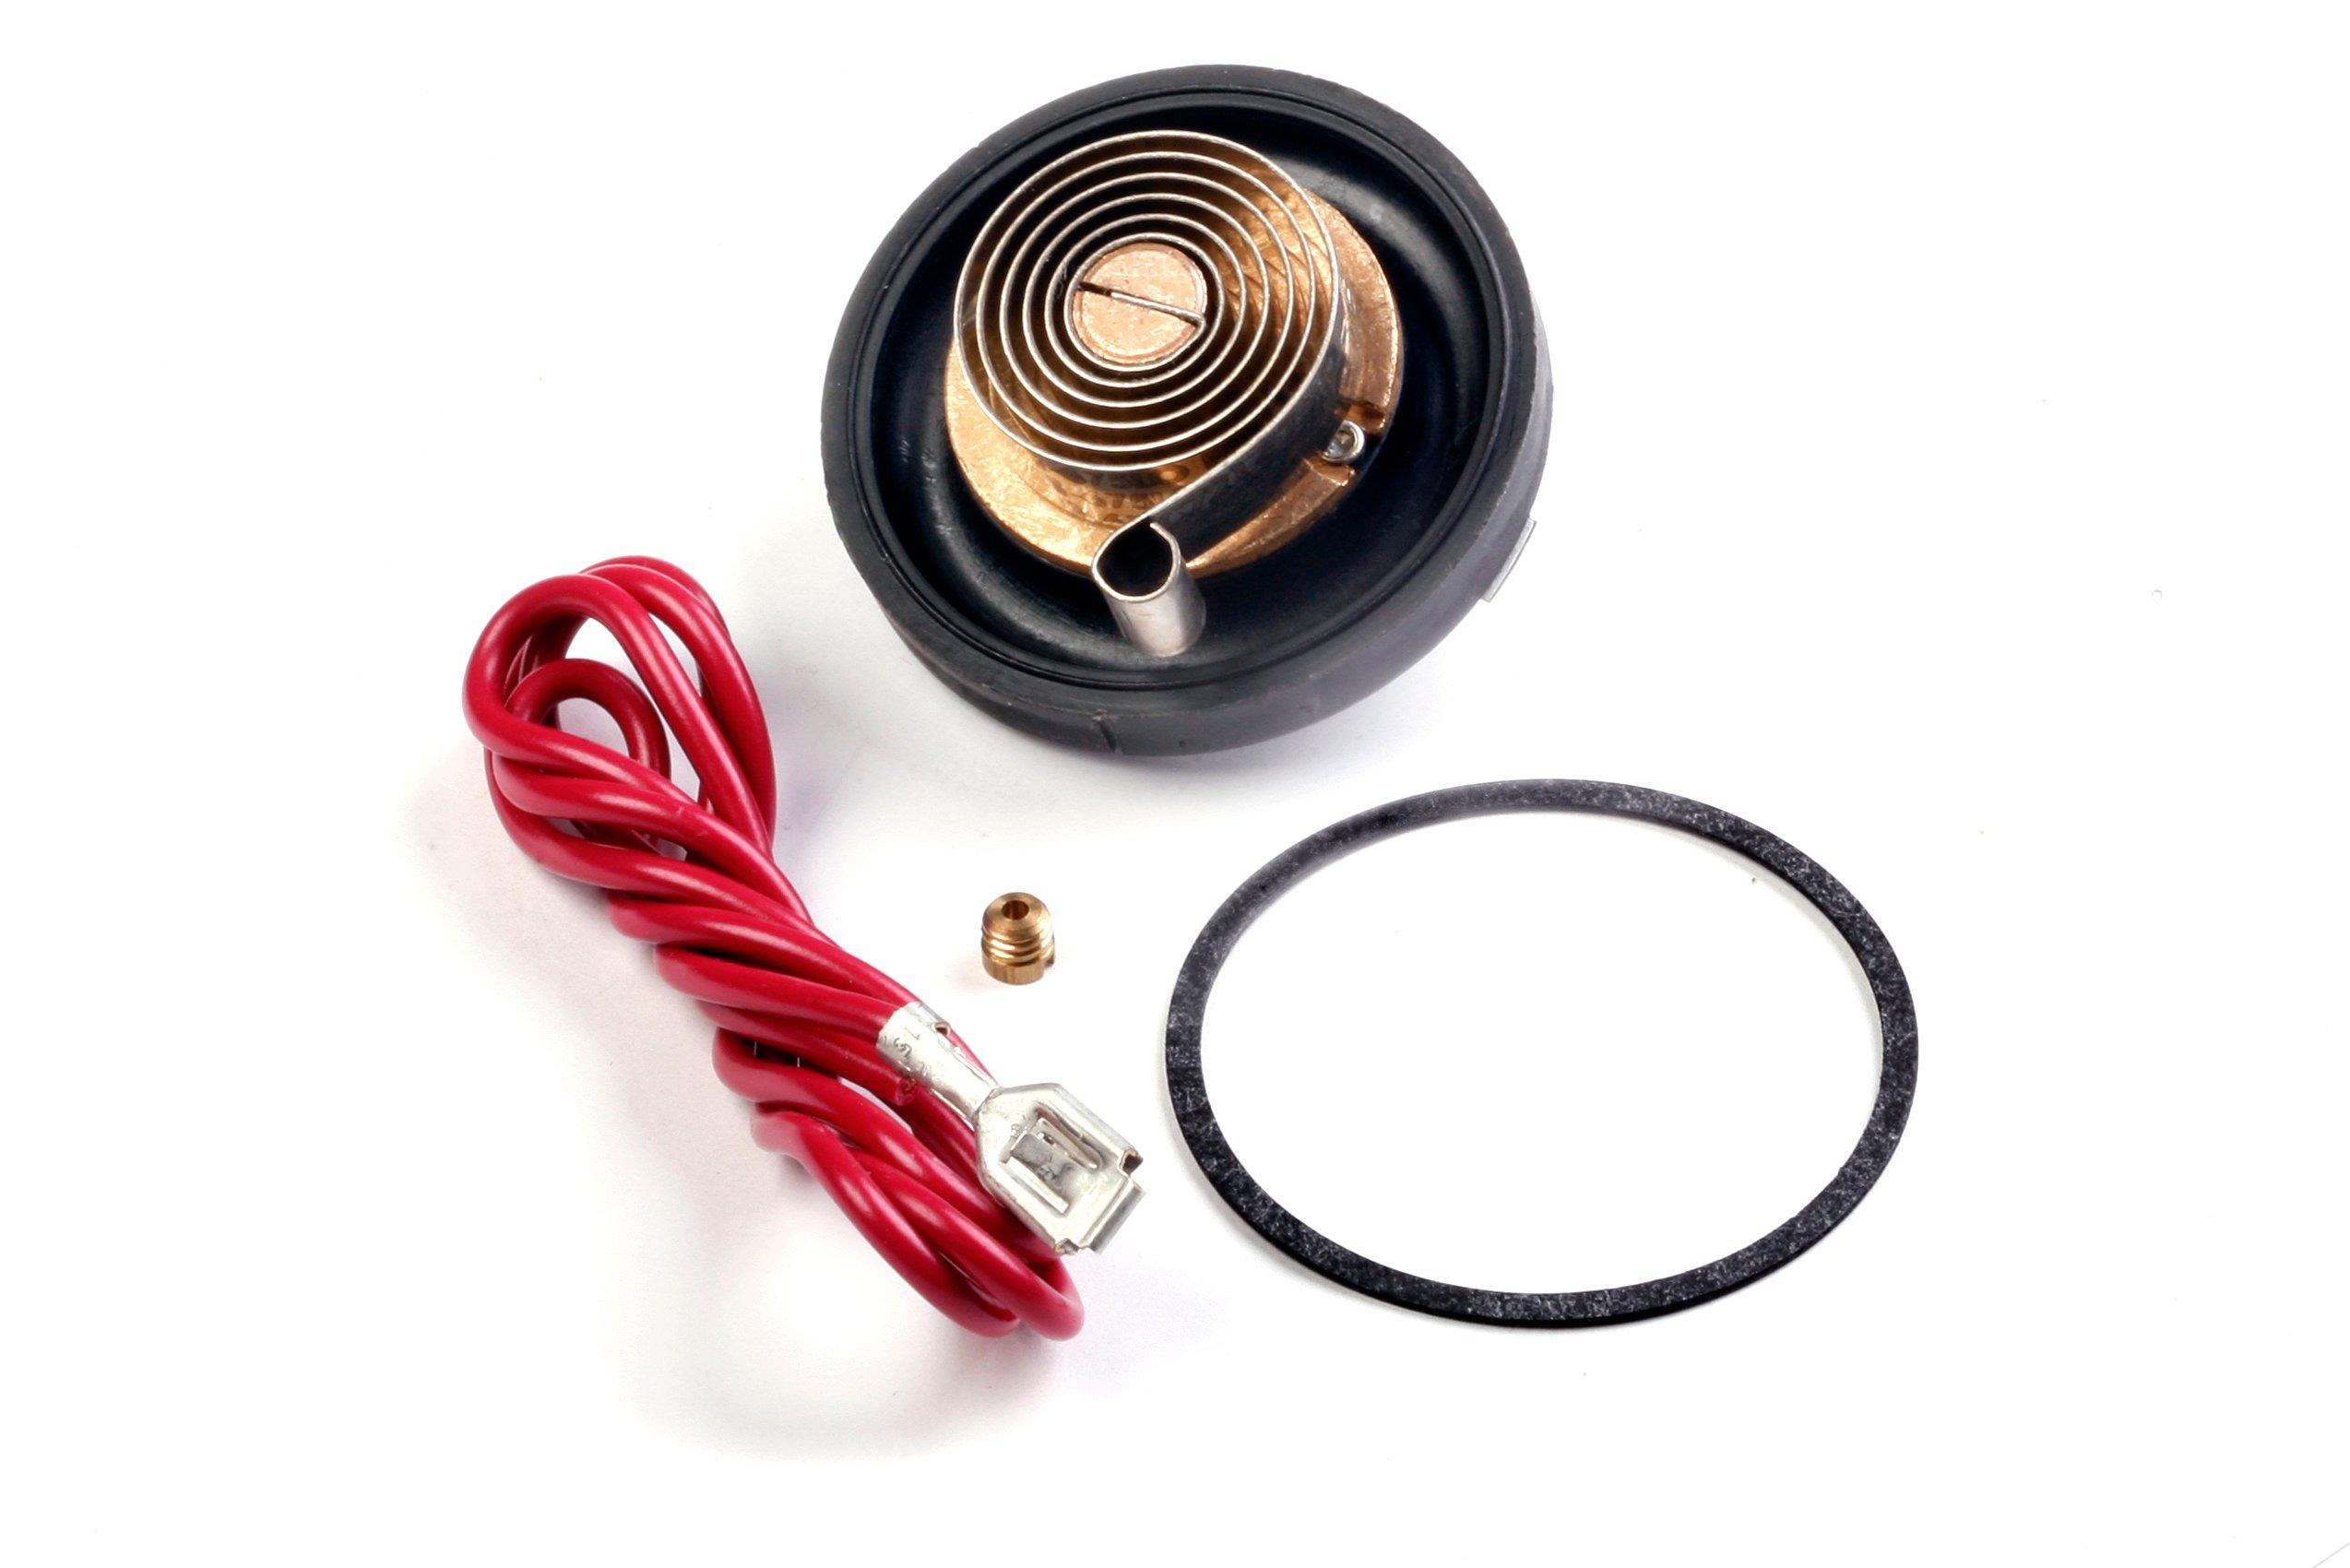 Ford Linc 41 Vacuum Intake Manifold Caps Carburetor Throttle Body Rubber Plugs